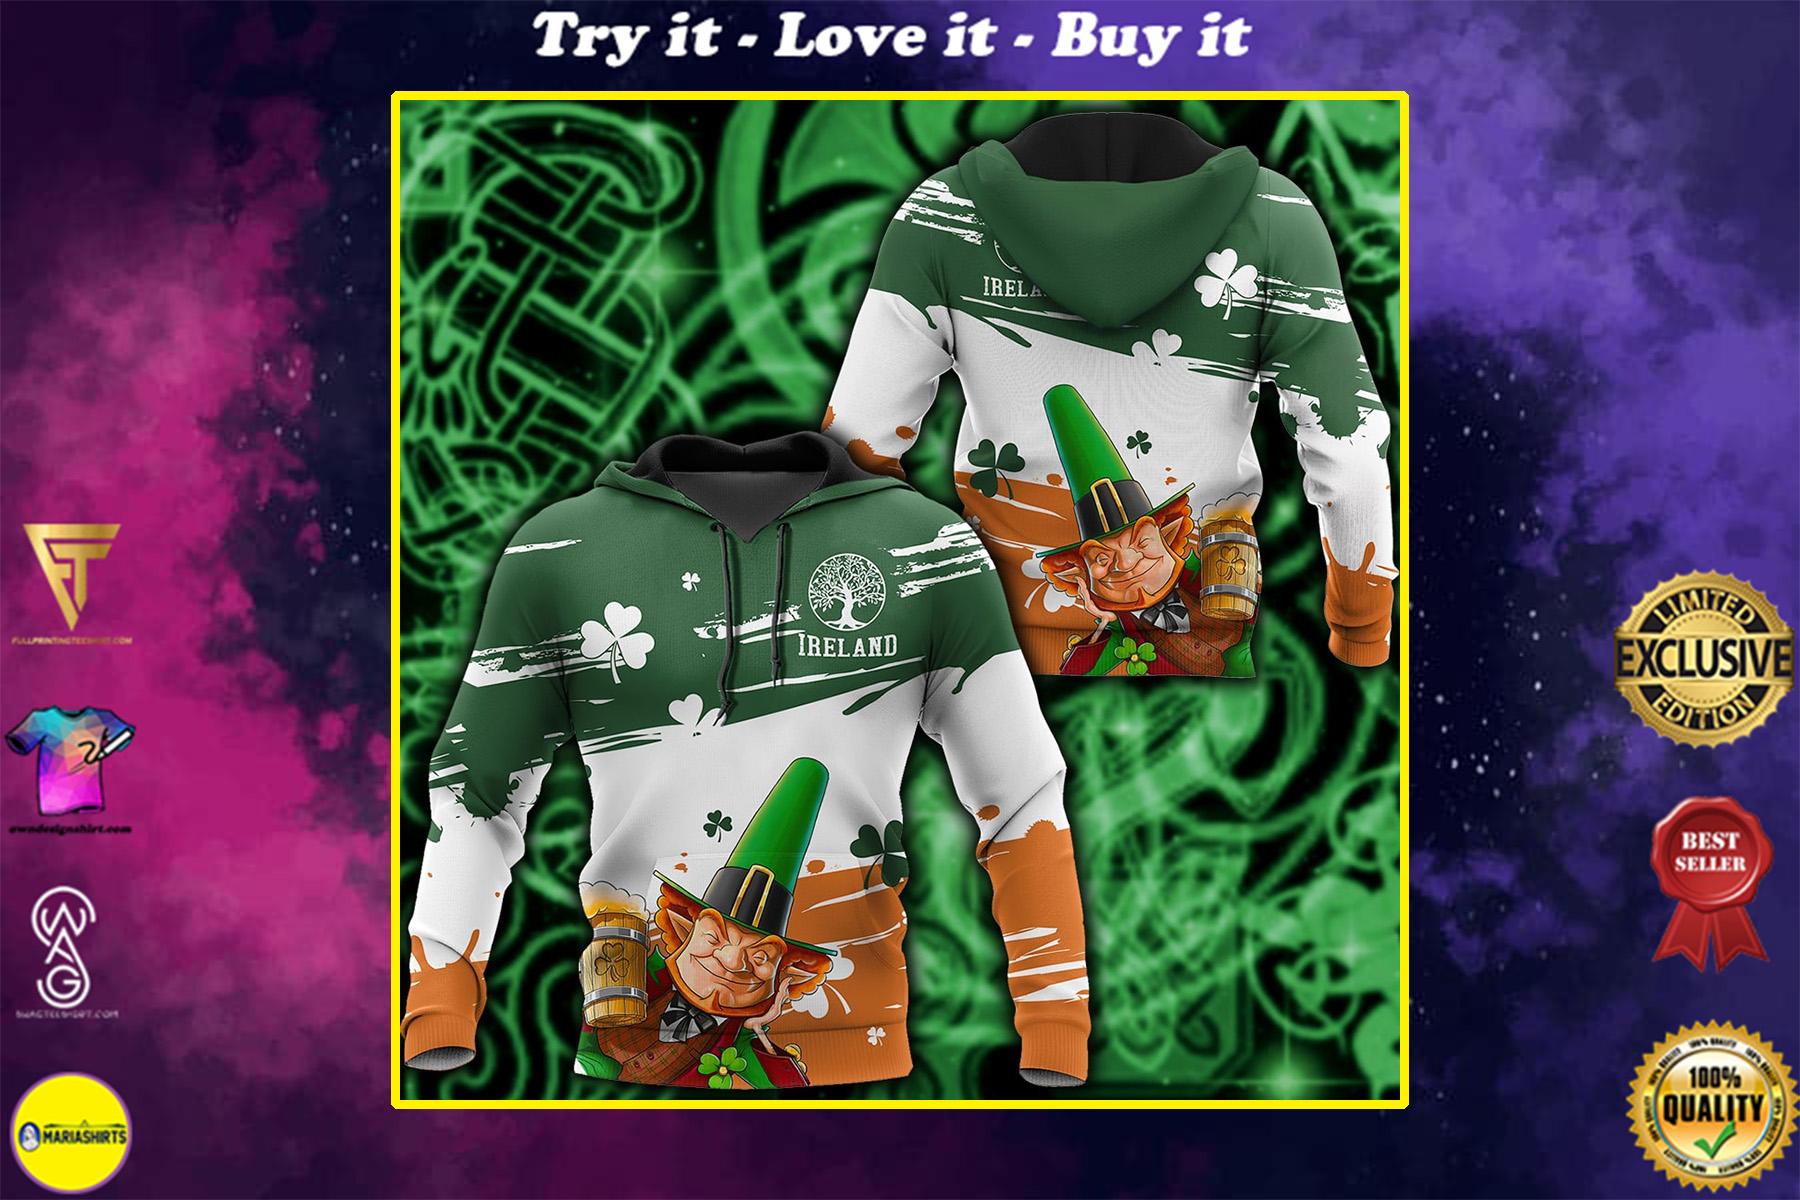 saint patricks day ireland leprechauns full printing shirt